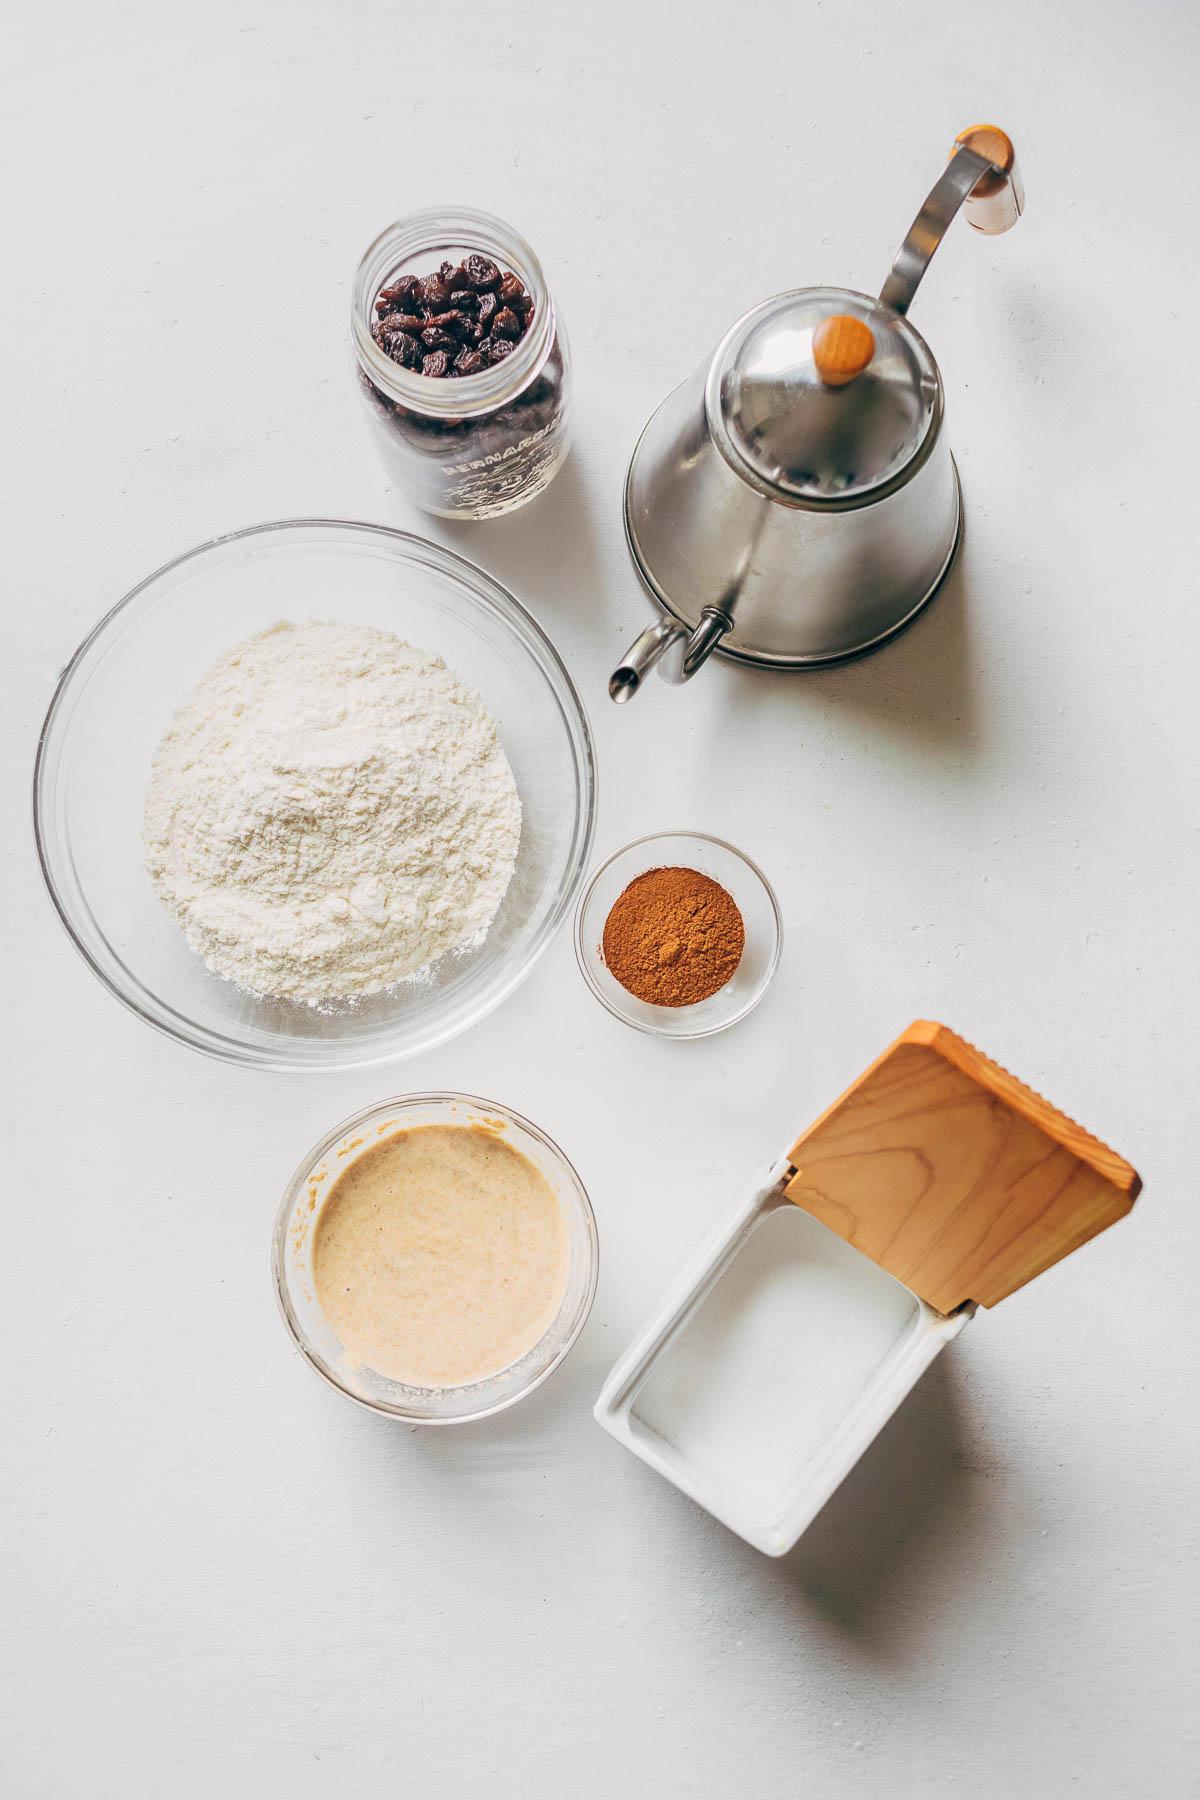 Cinnamon raisin sourdough ingredients.